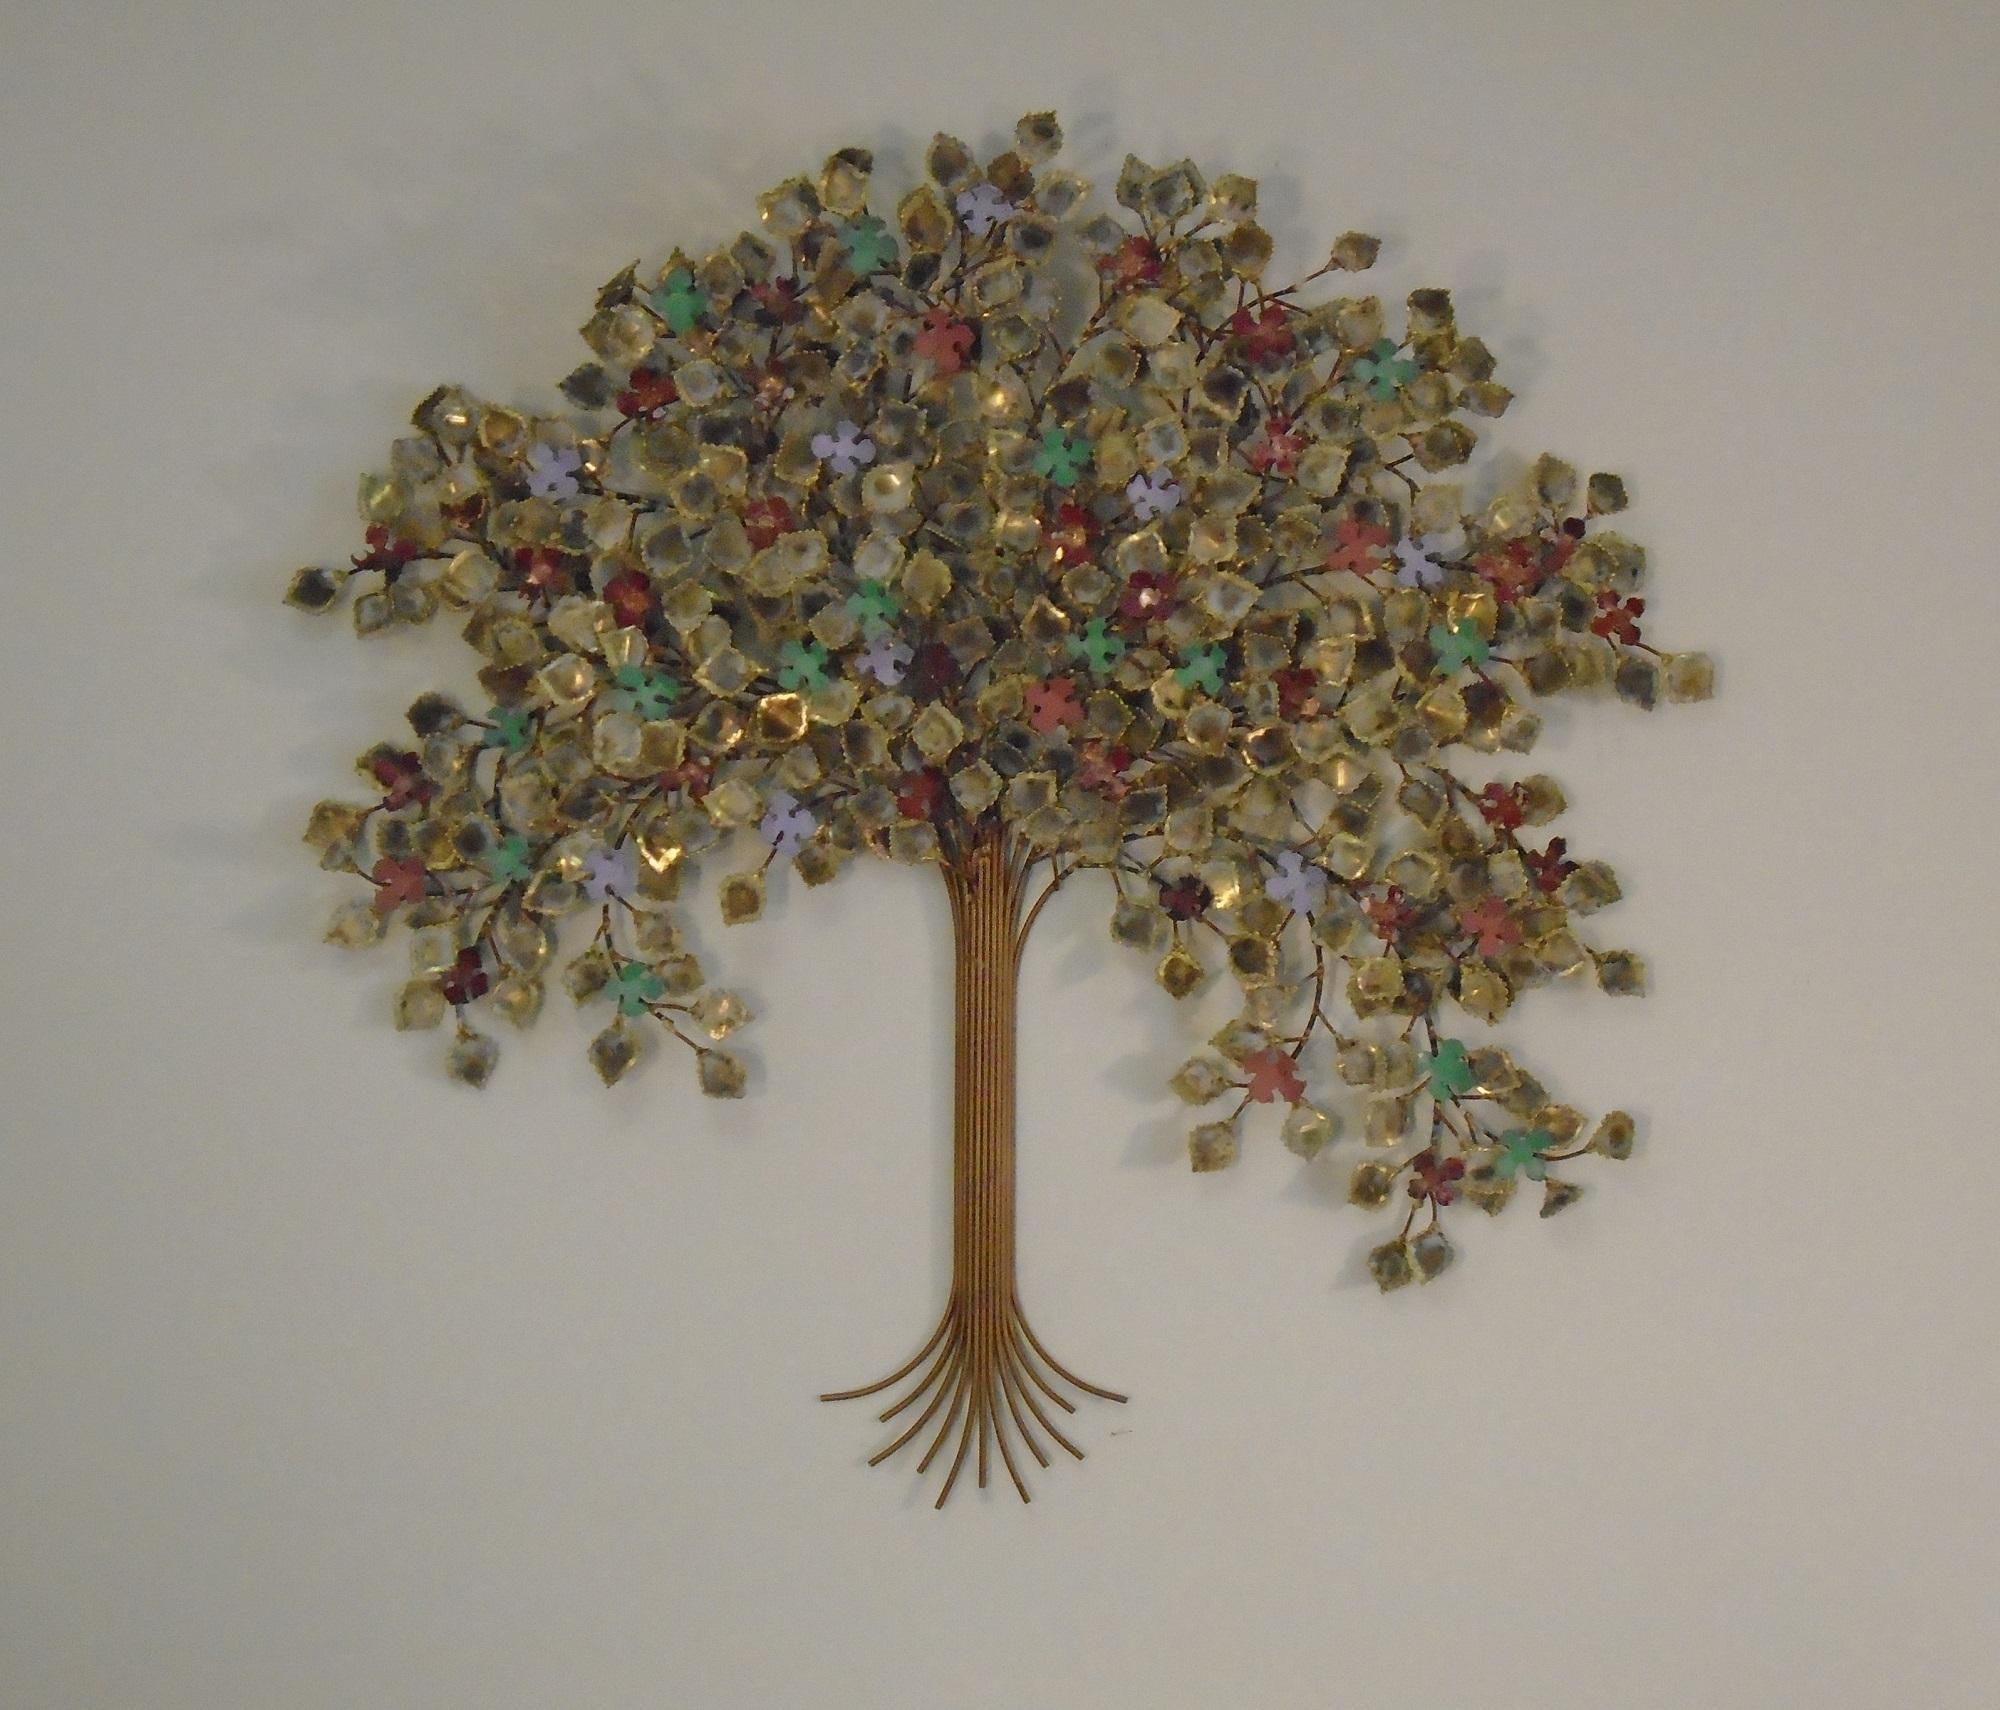 Tree Of Life Metal Wall Art - Metal Sculpture Wall Decor - Gurtan within Metal Tree Wall Art (Image 17 of 21)